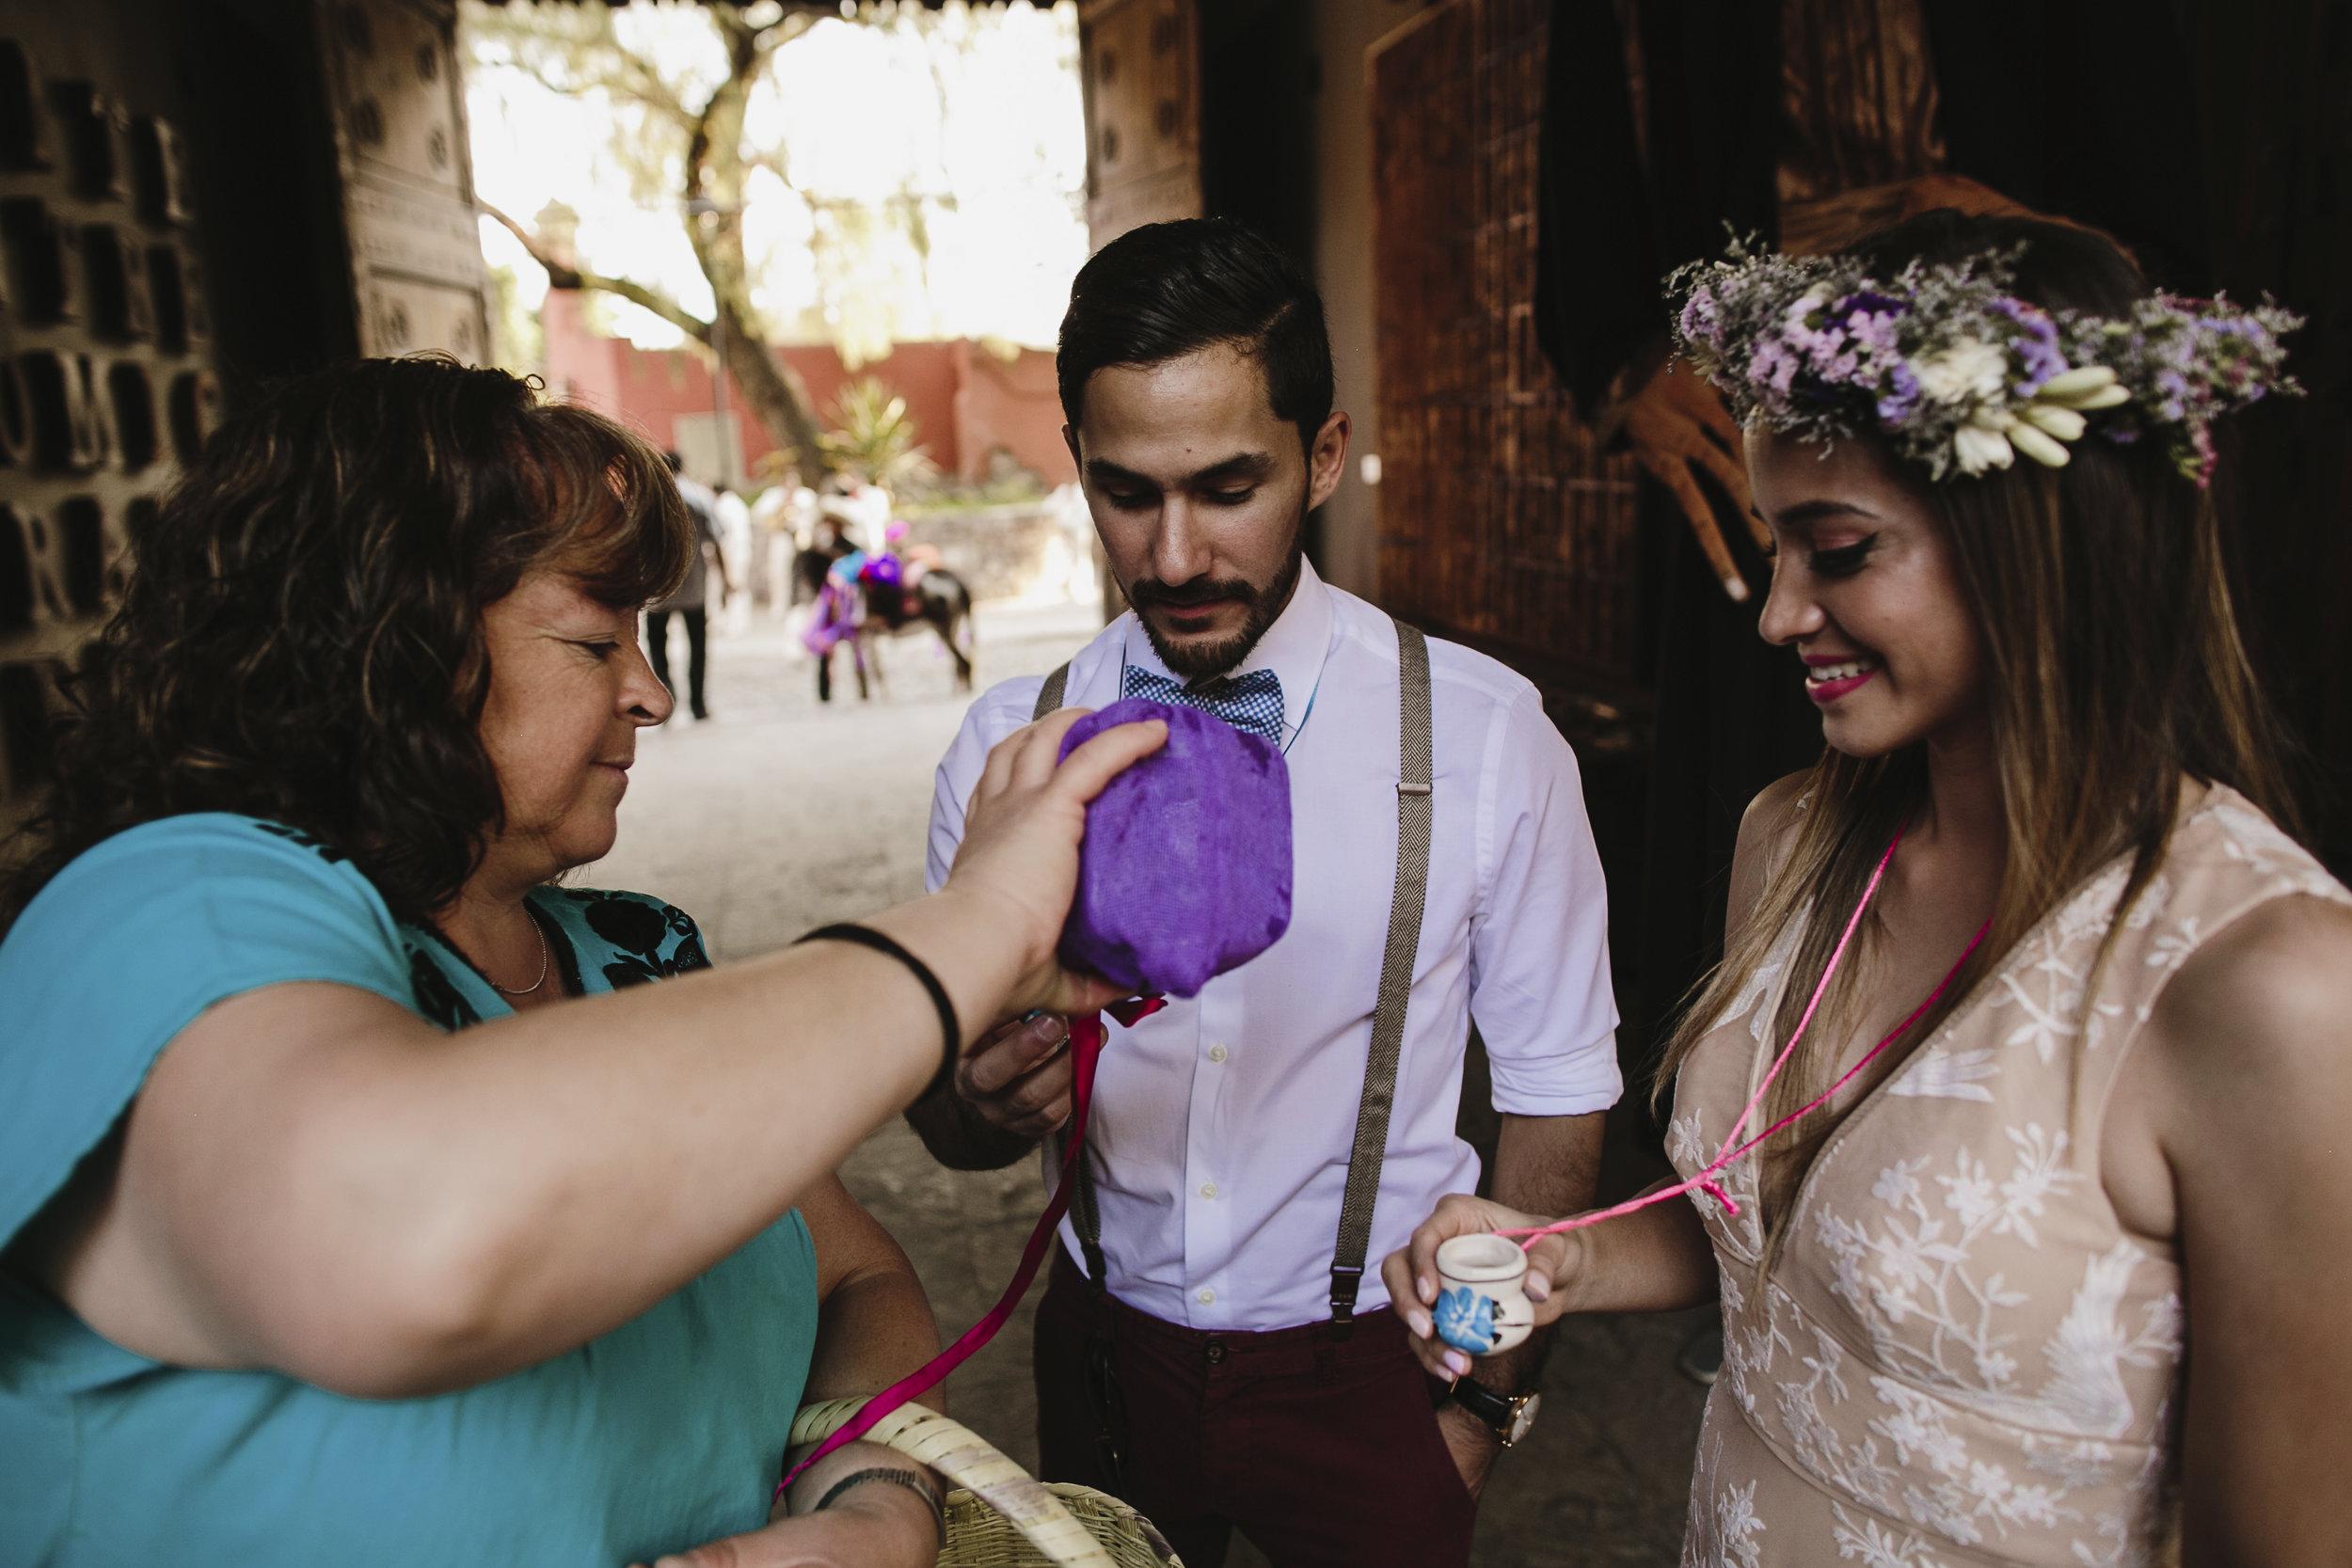 alfons_flores_destination_wedding_photography_mavi_david-269.JPG